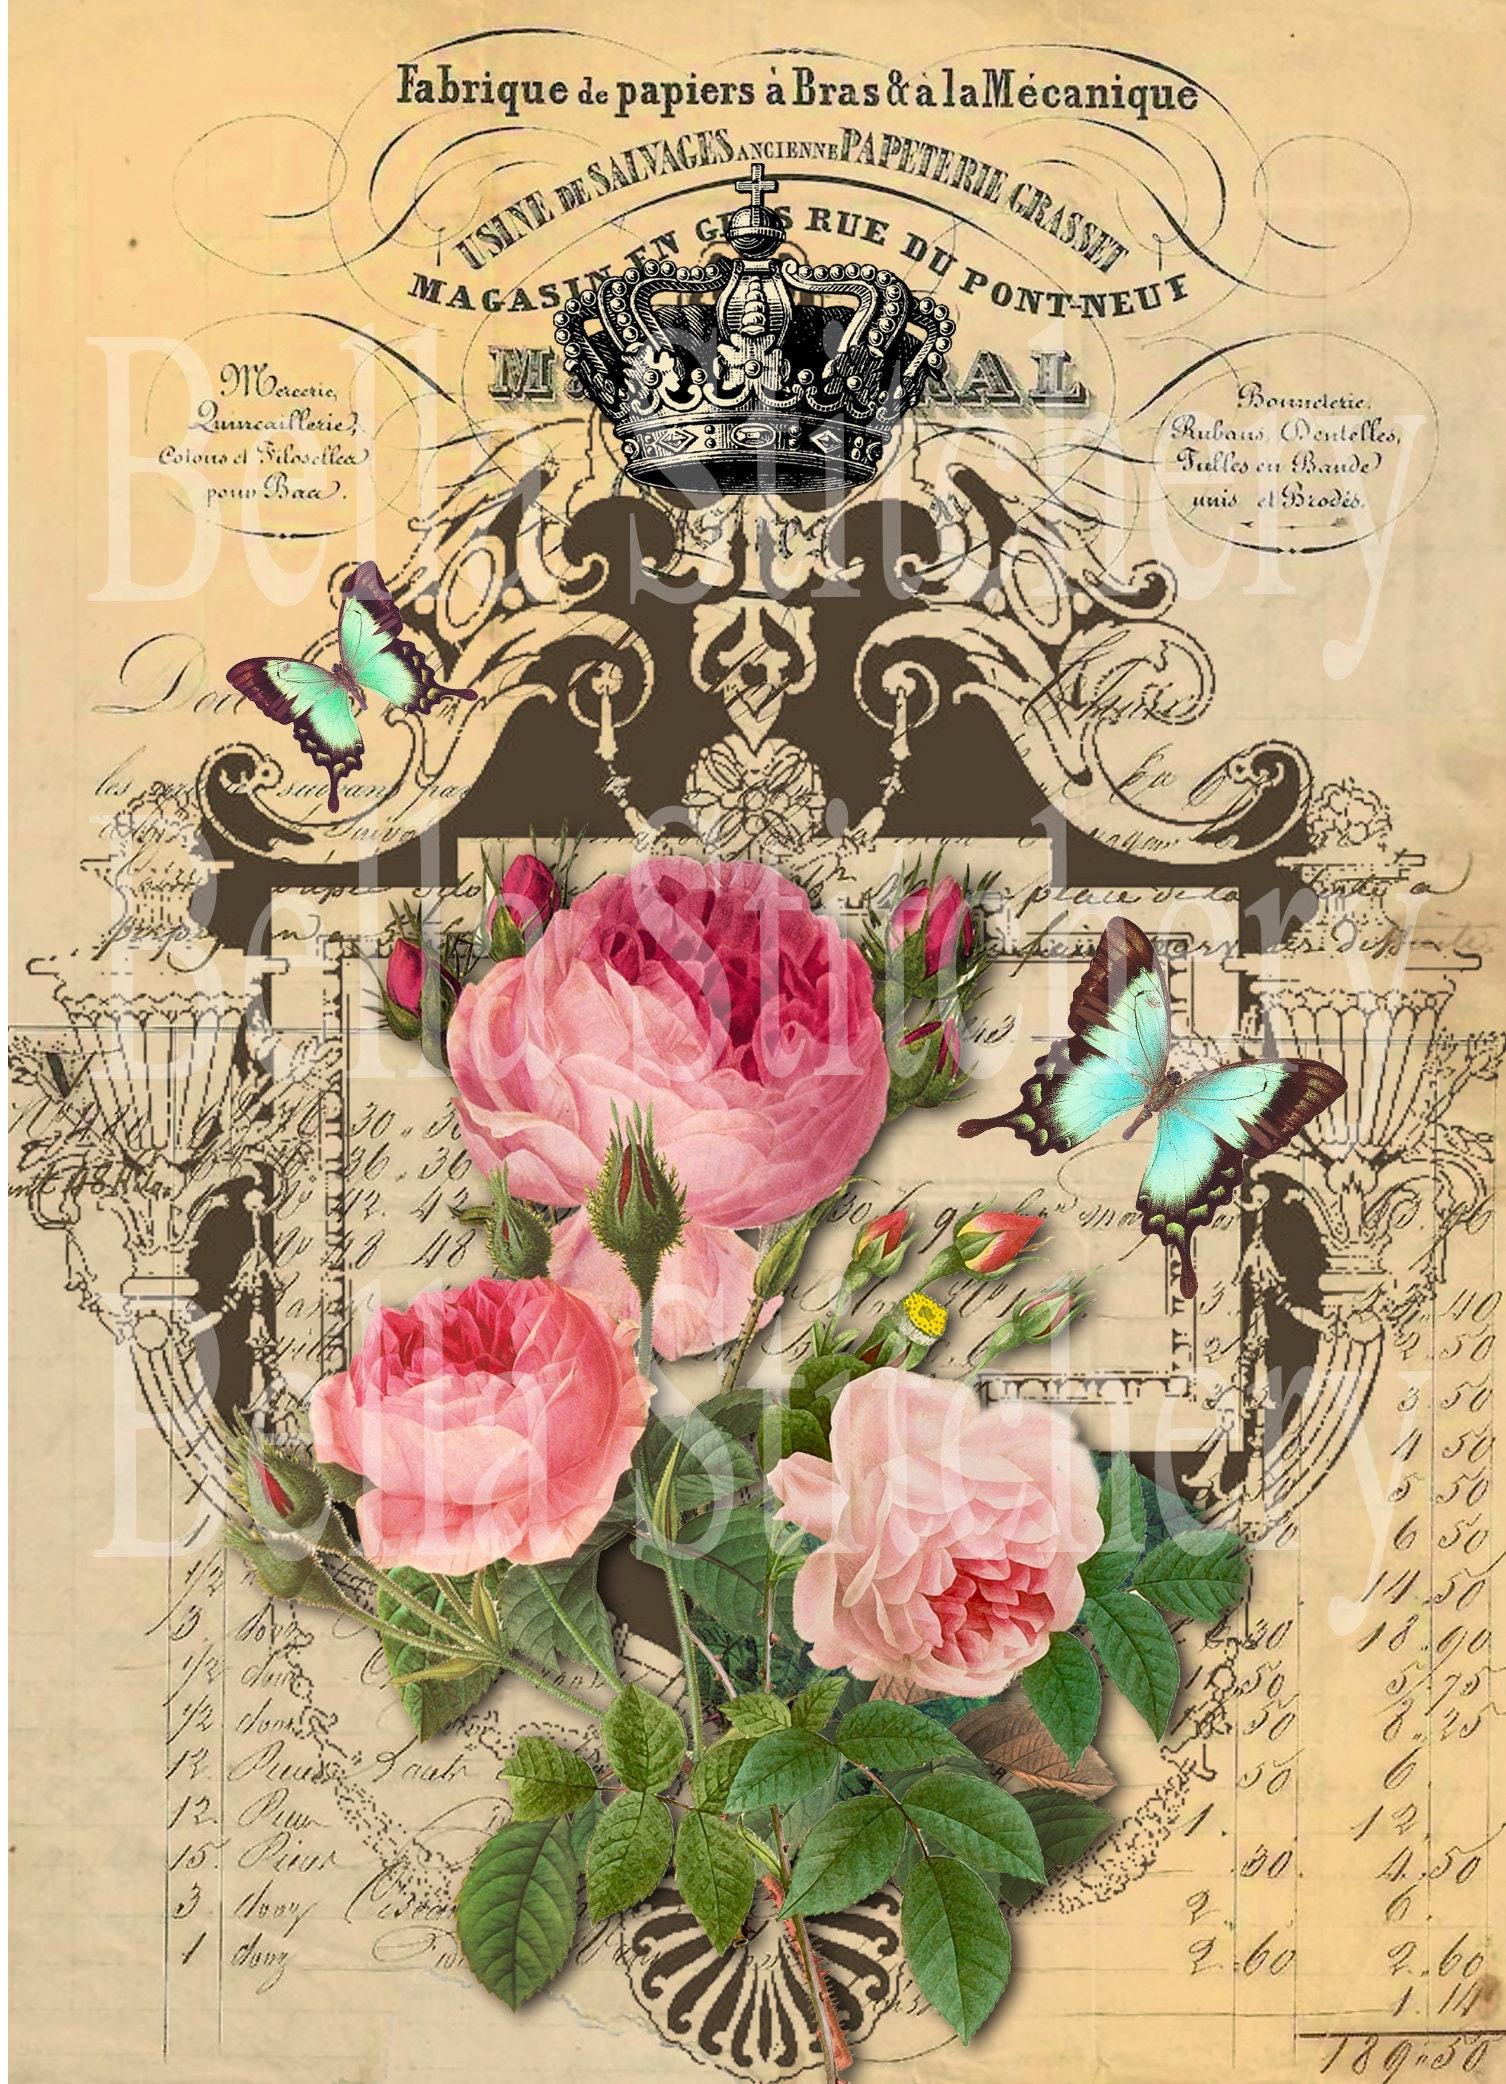 Papillons et shabby Chic Roses Roses Chic Collage #2-8 x 10 tissu bloc - idéal pour le Quilting, oreillers & Art mural - acheter 2, Get 1 FREE e9d660